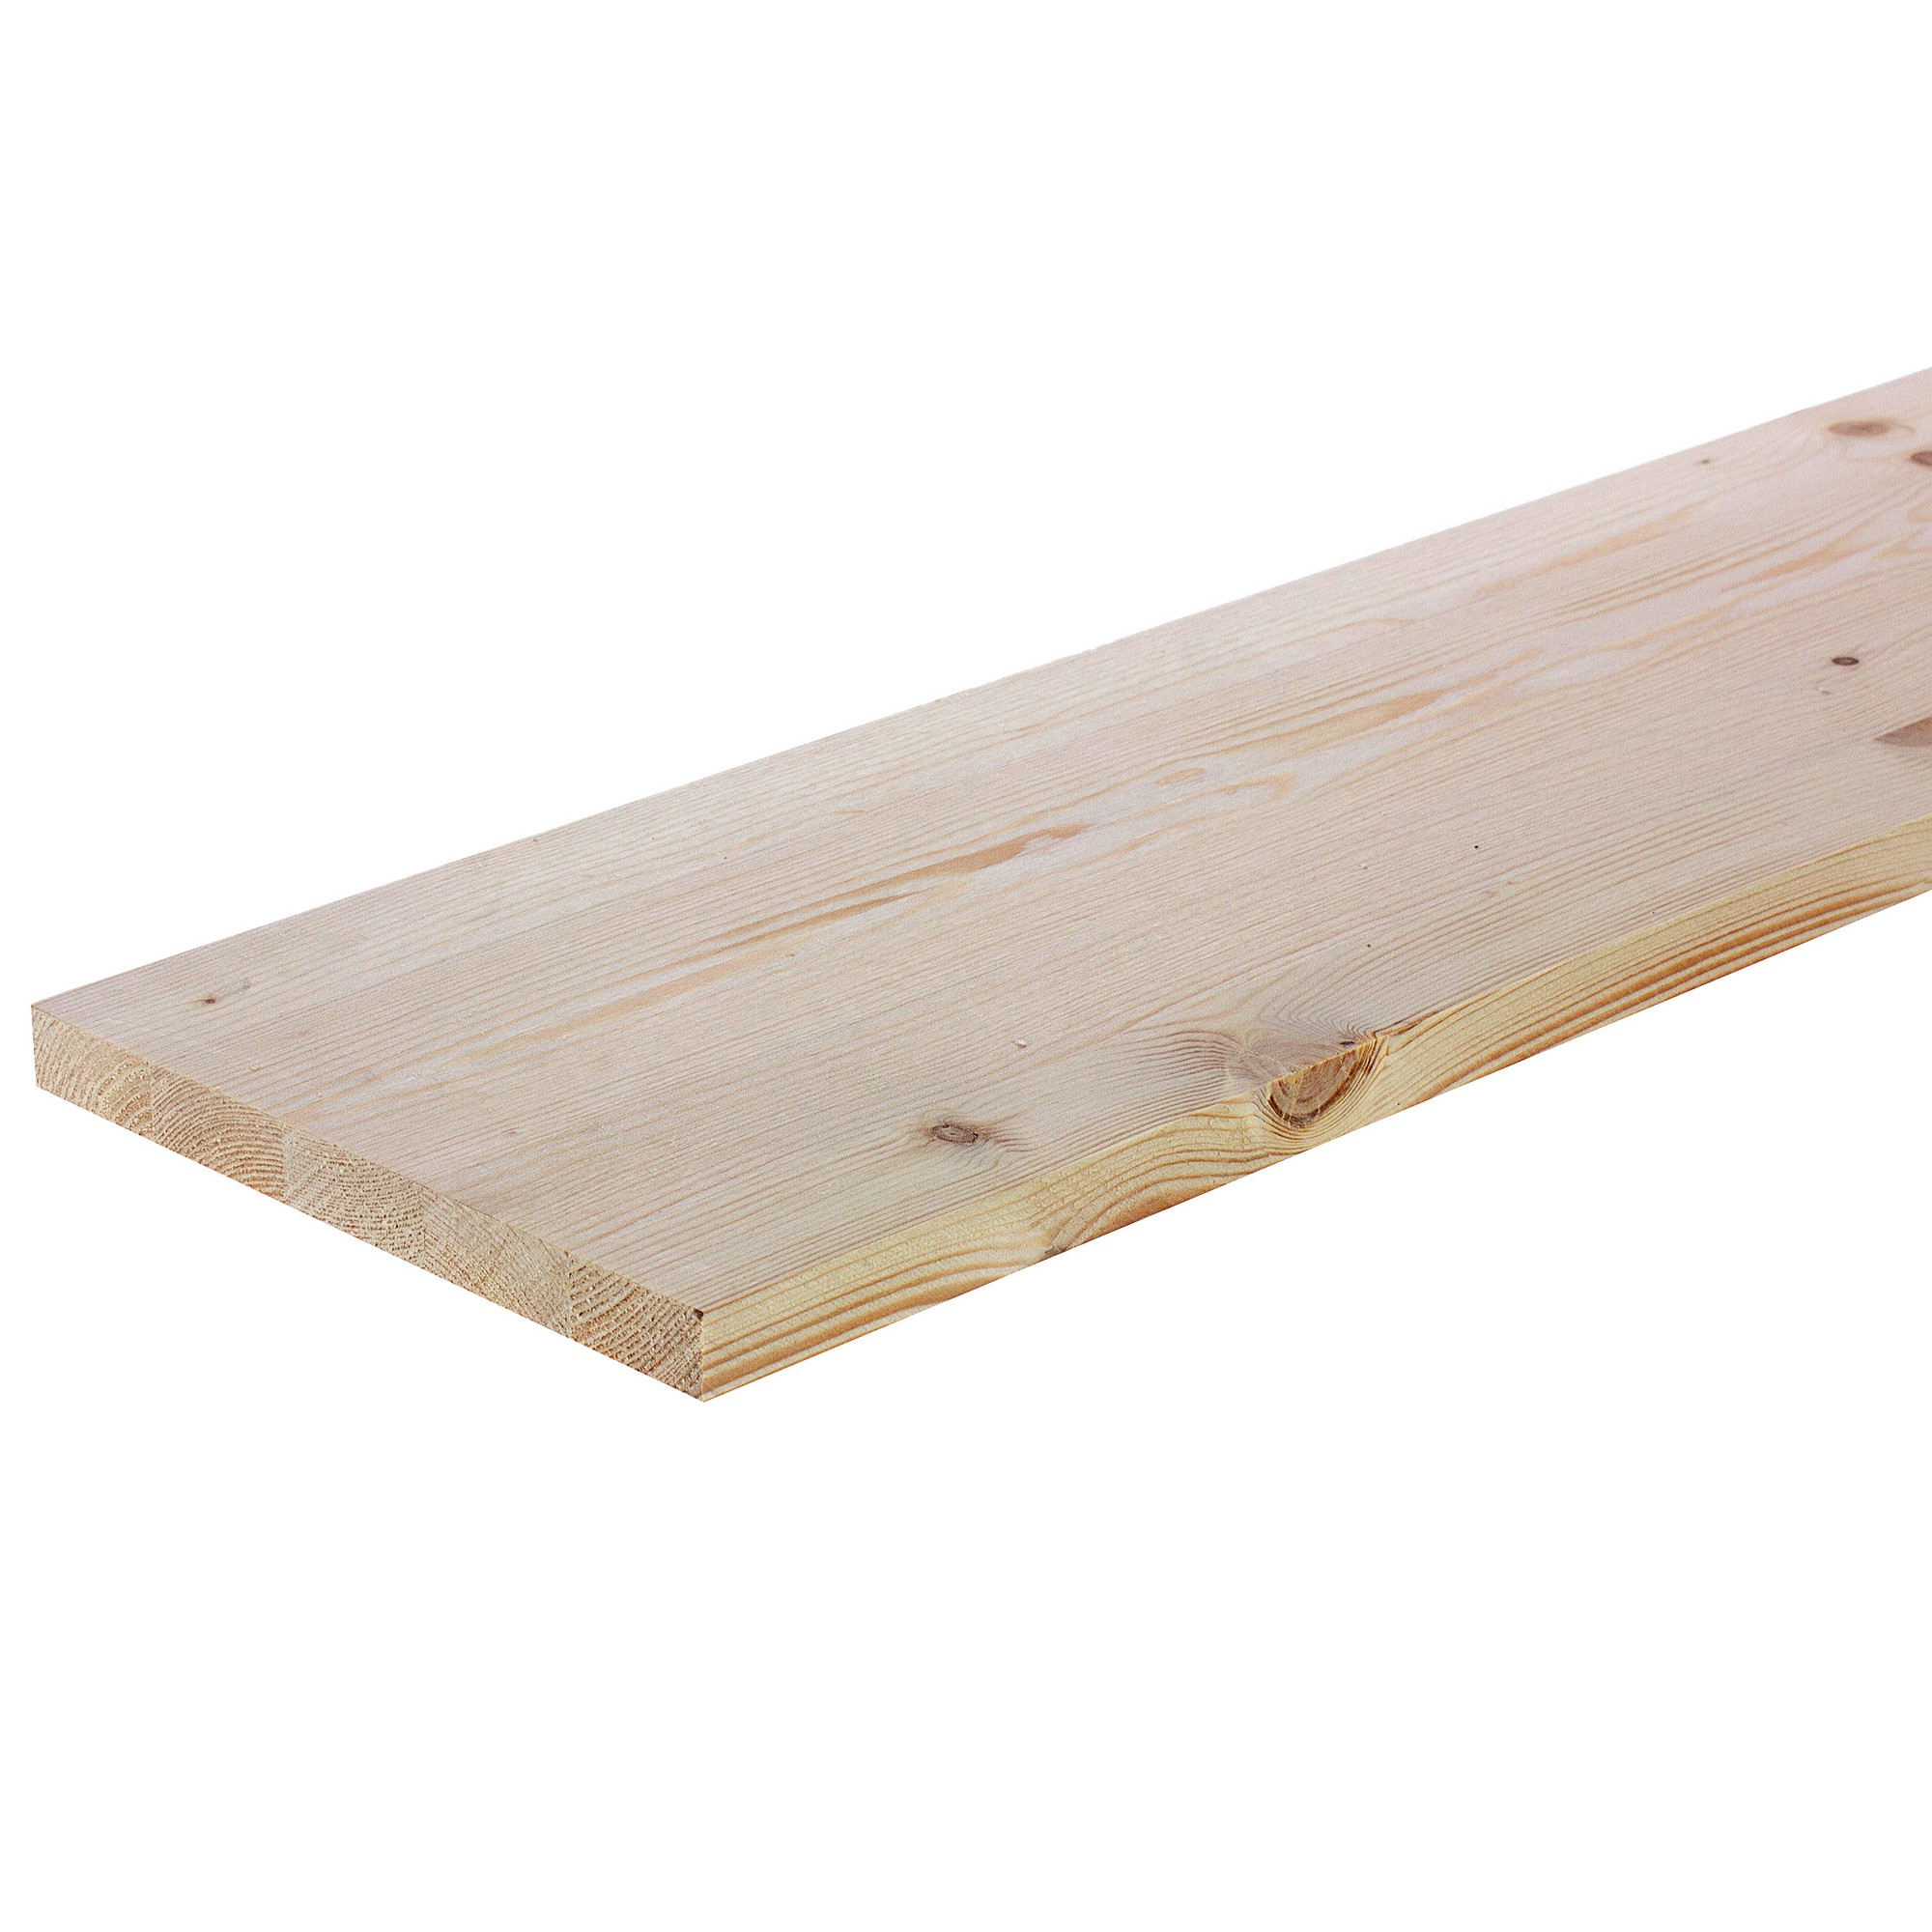 Мебельный щит 1600х200х18 мм хвоя, сорт A/B